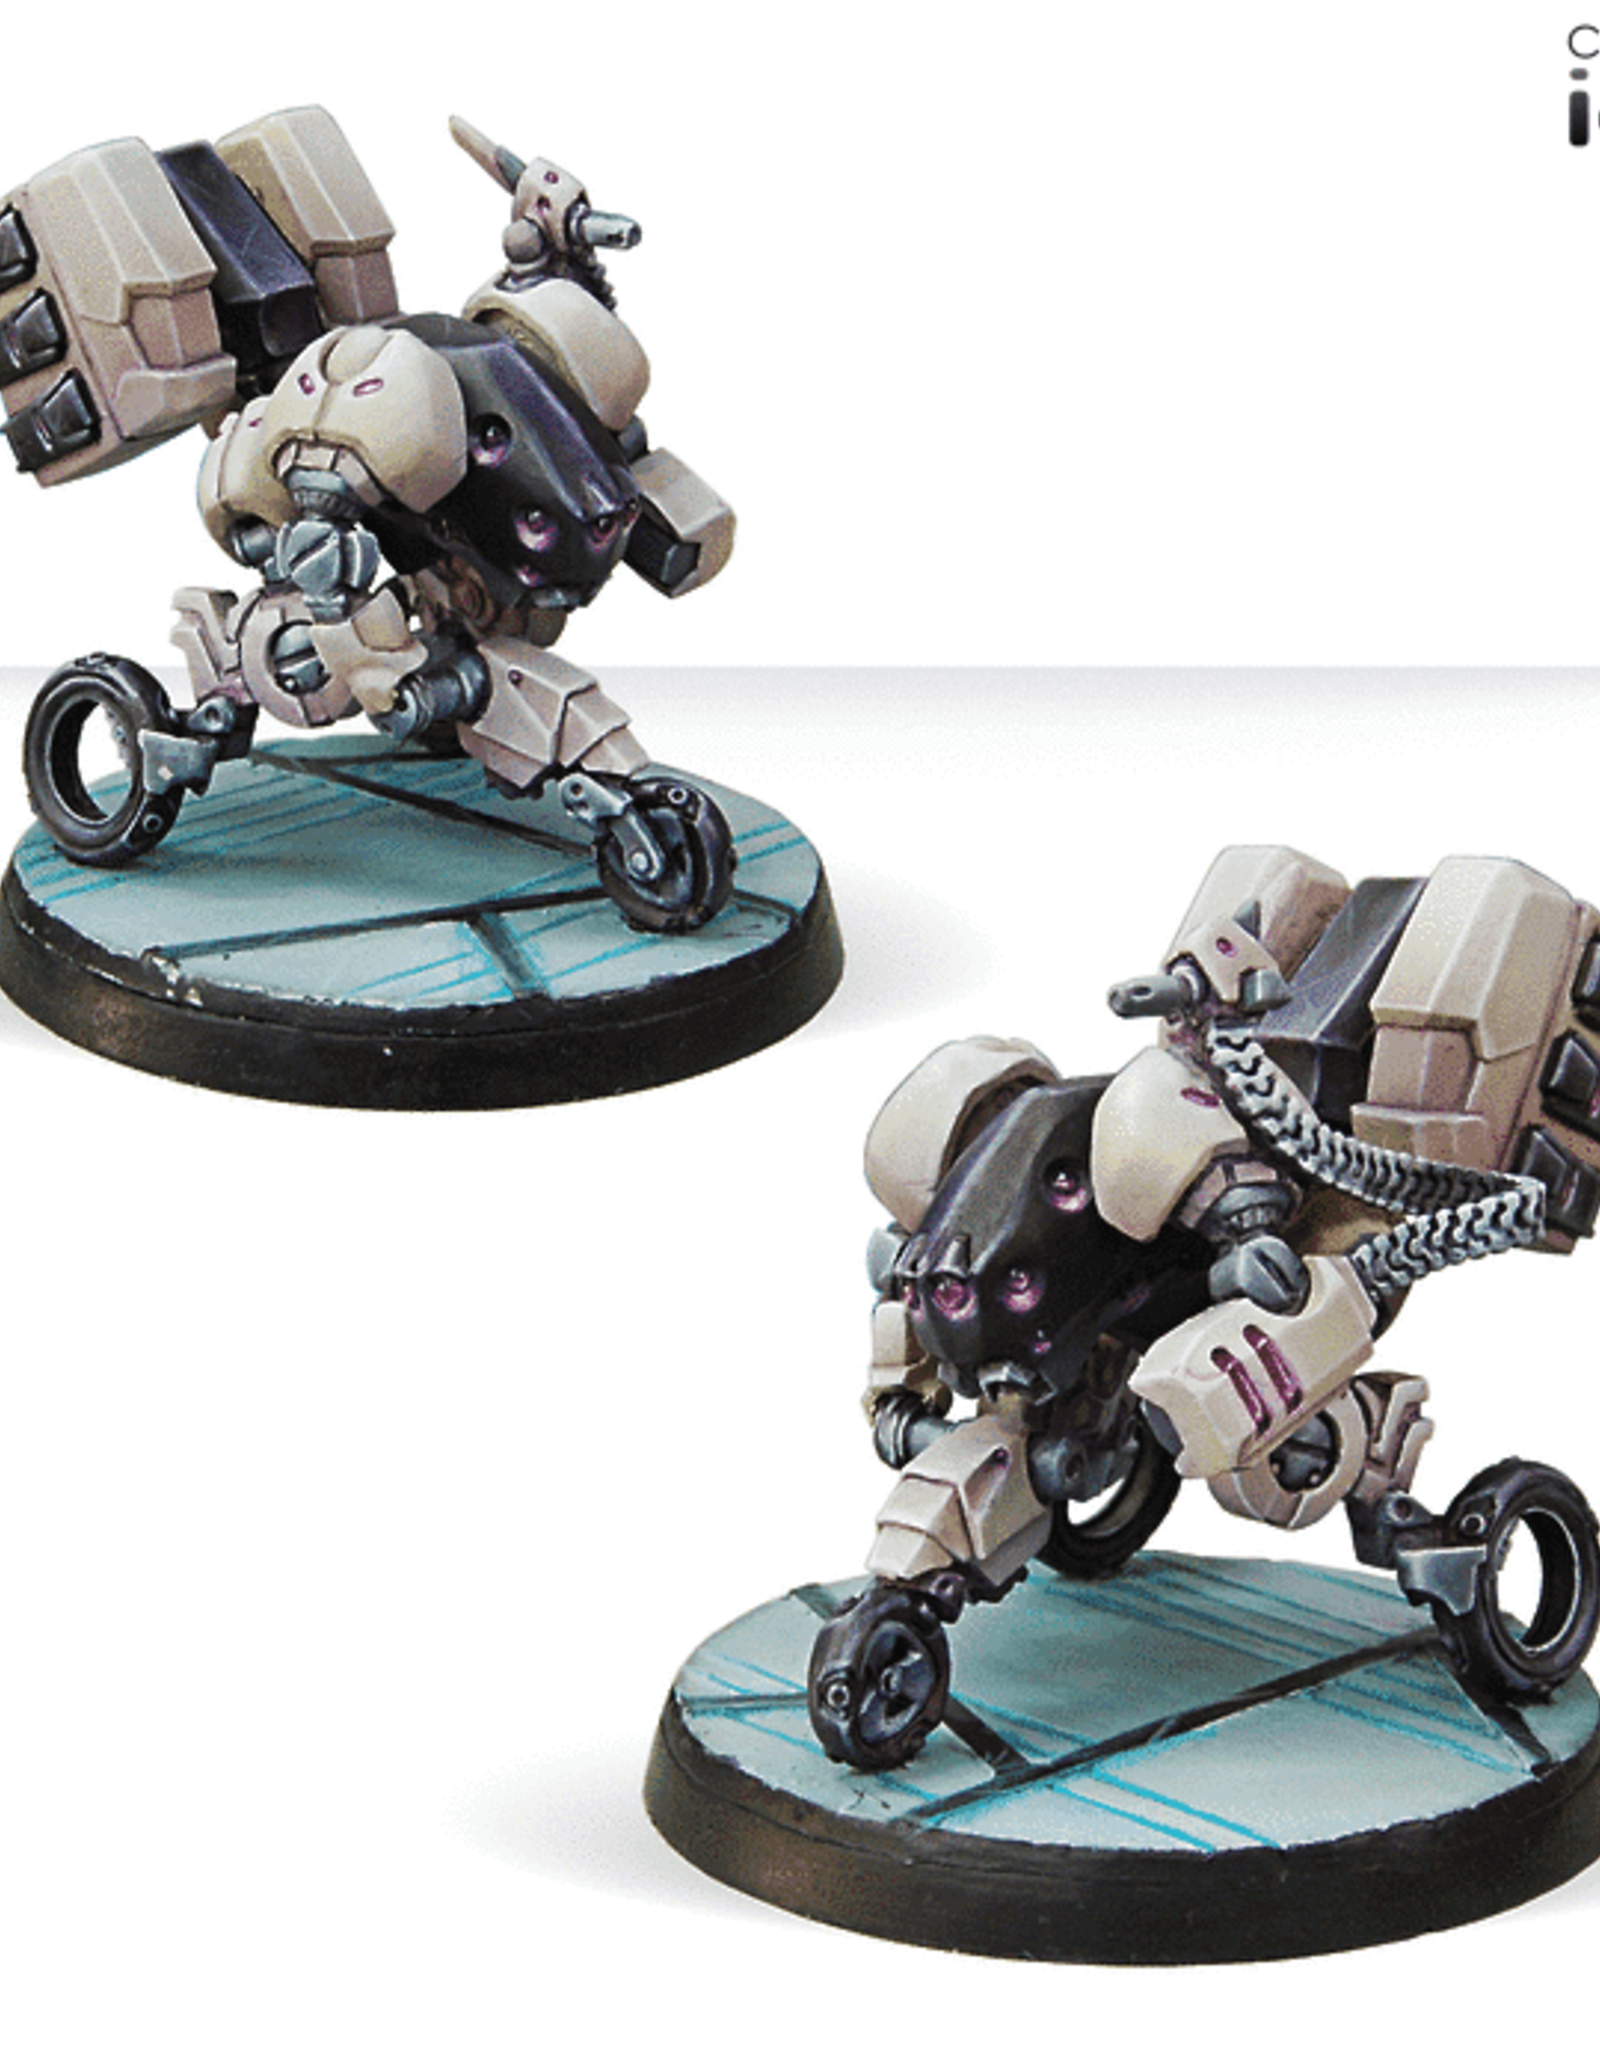 Corvus Belli Probots (EVO Repeater, Combi Rifle)